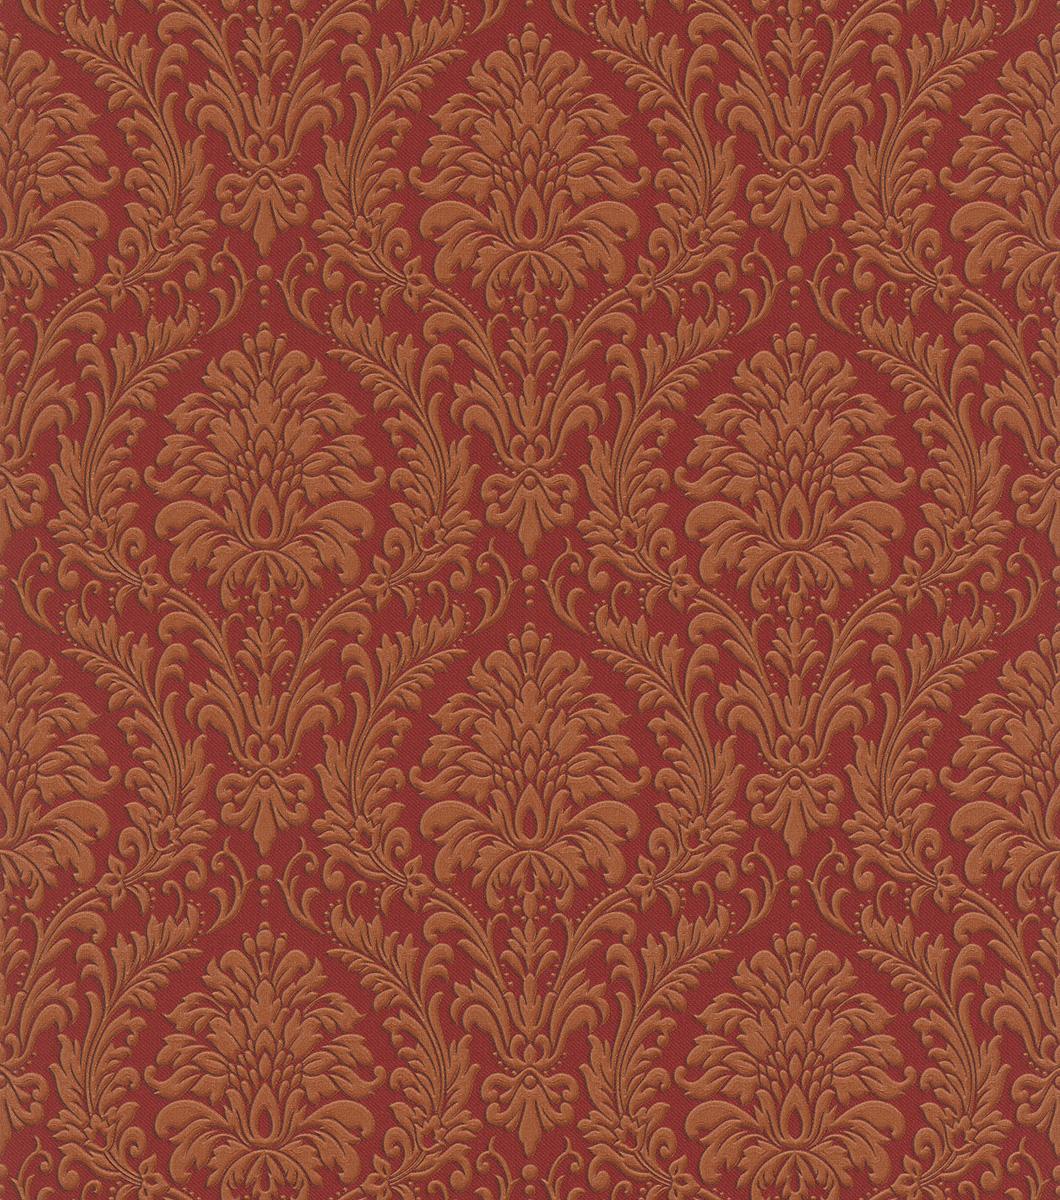 rasch tapeten trianon 2015 nr 512878 vlies 3 00 m. Black Bedroom Furniture Sets. Home Design Ideas